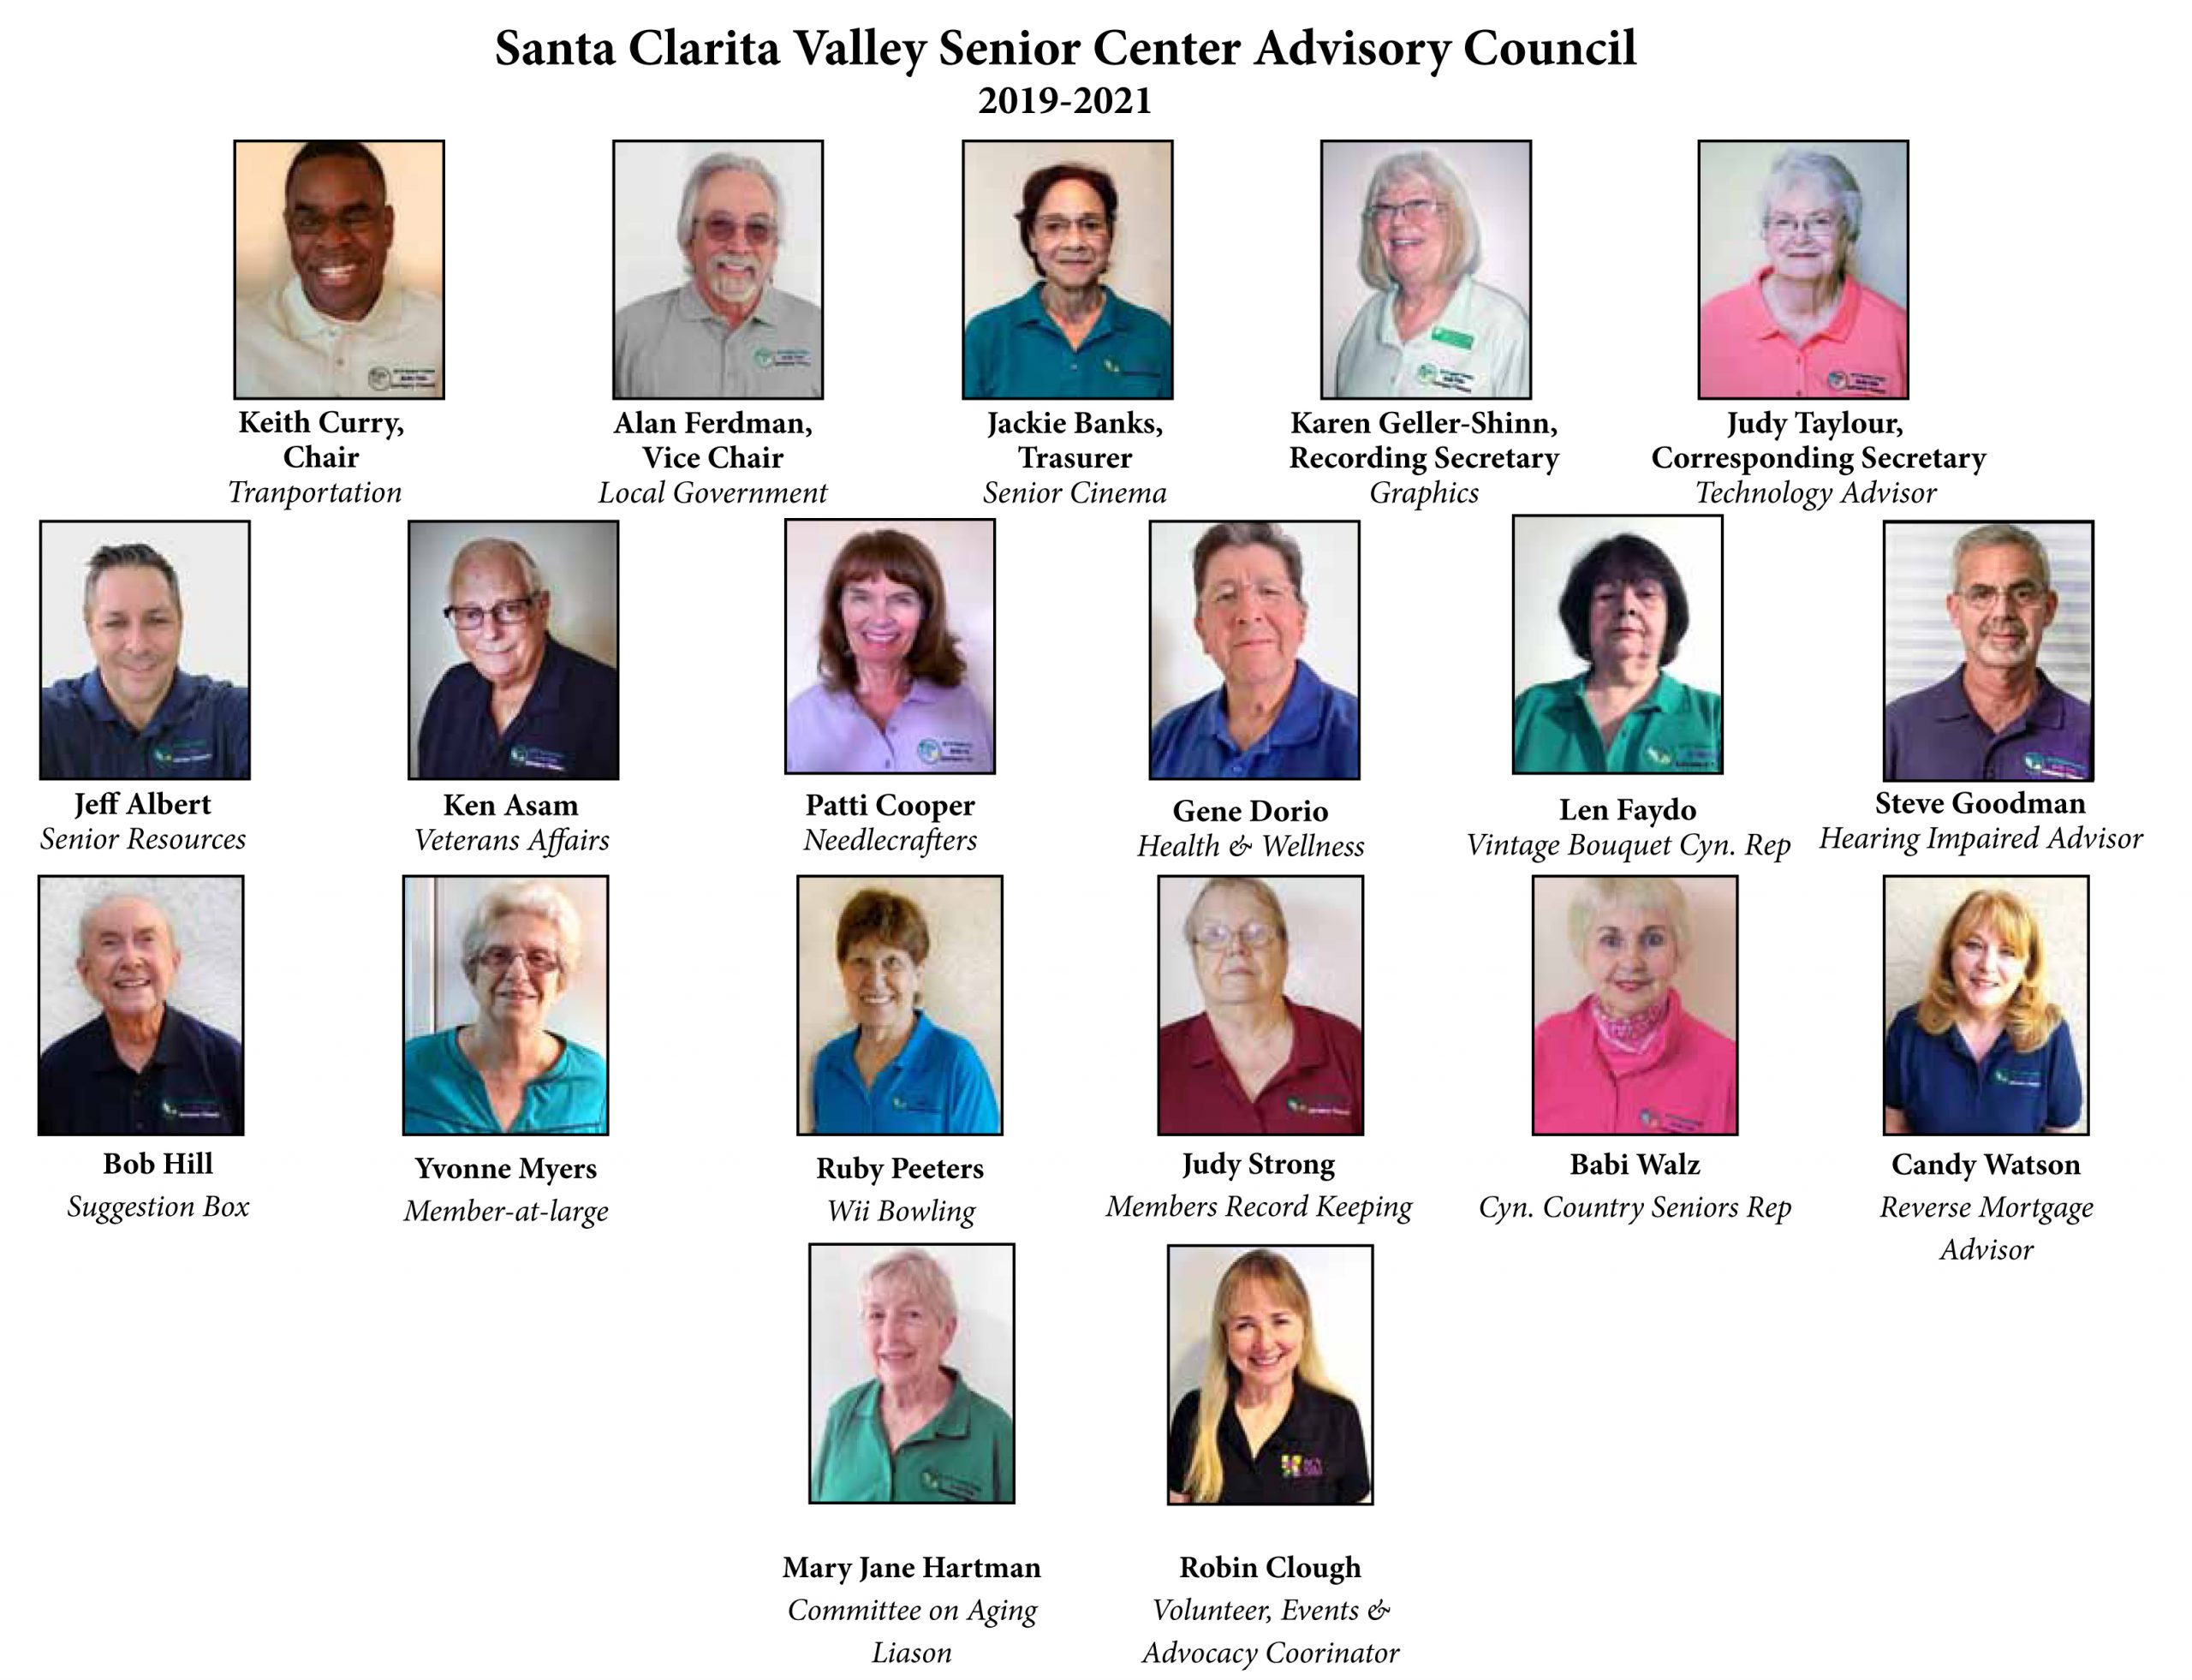 pictures of the santa calrita valley senior center advisory council